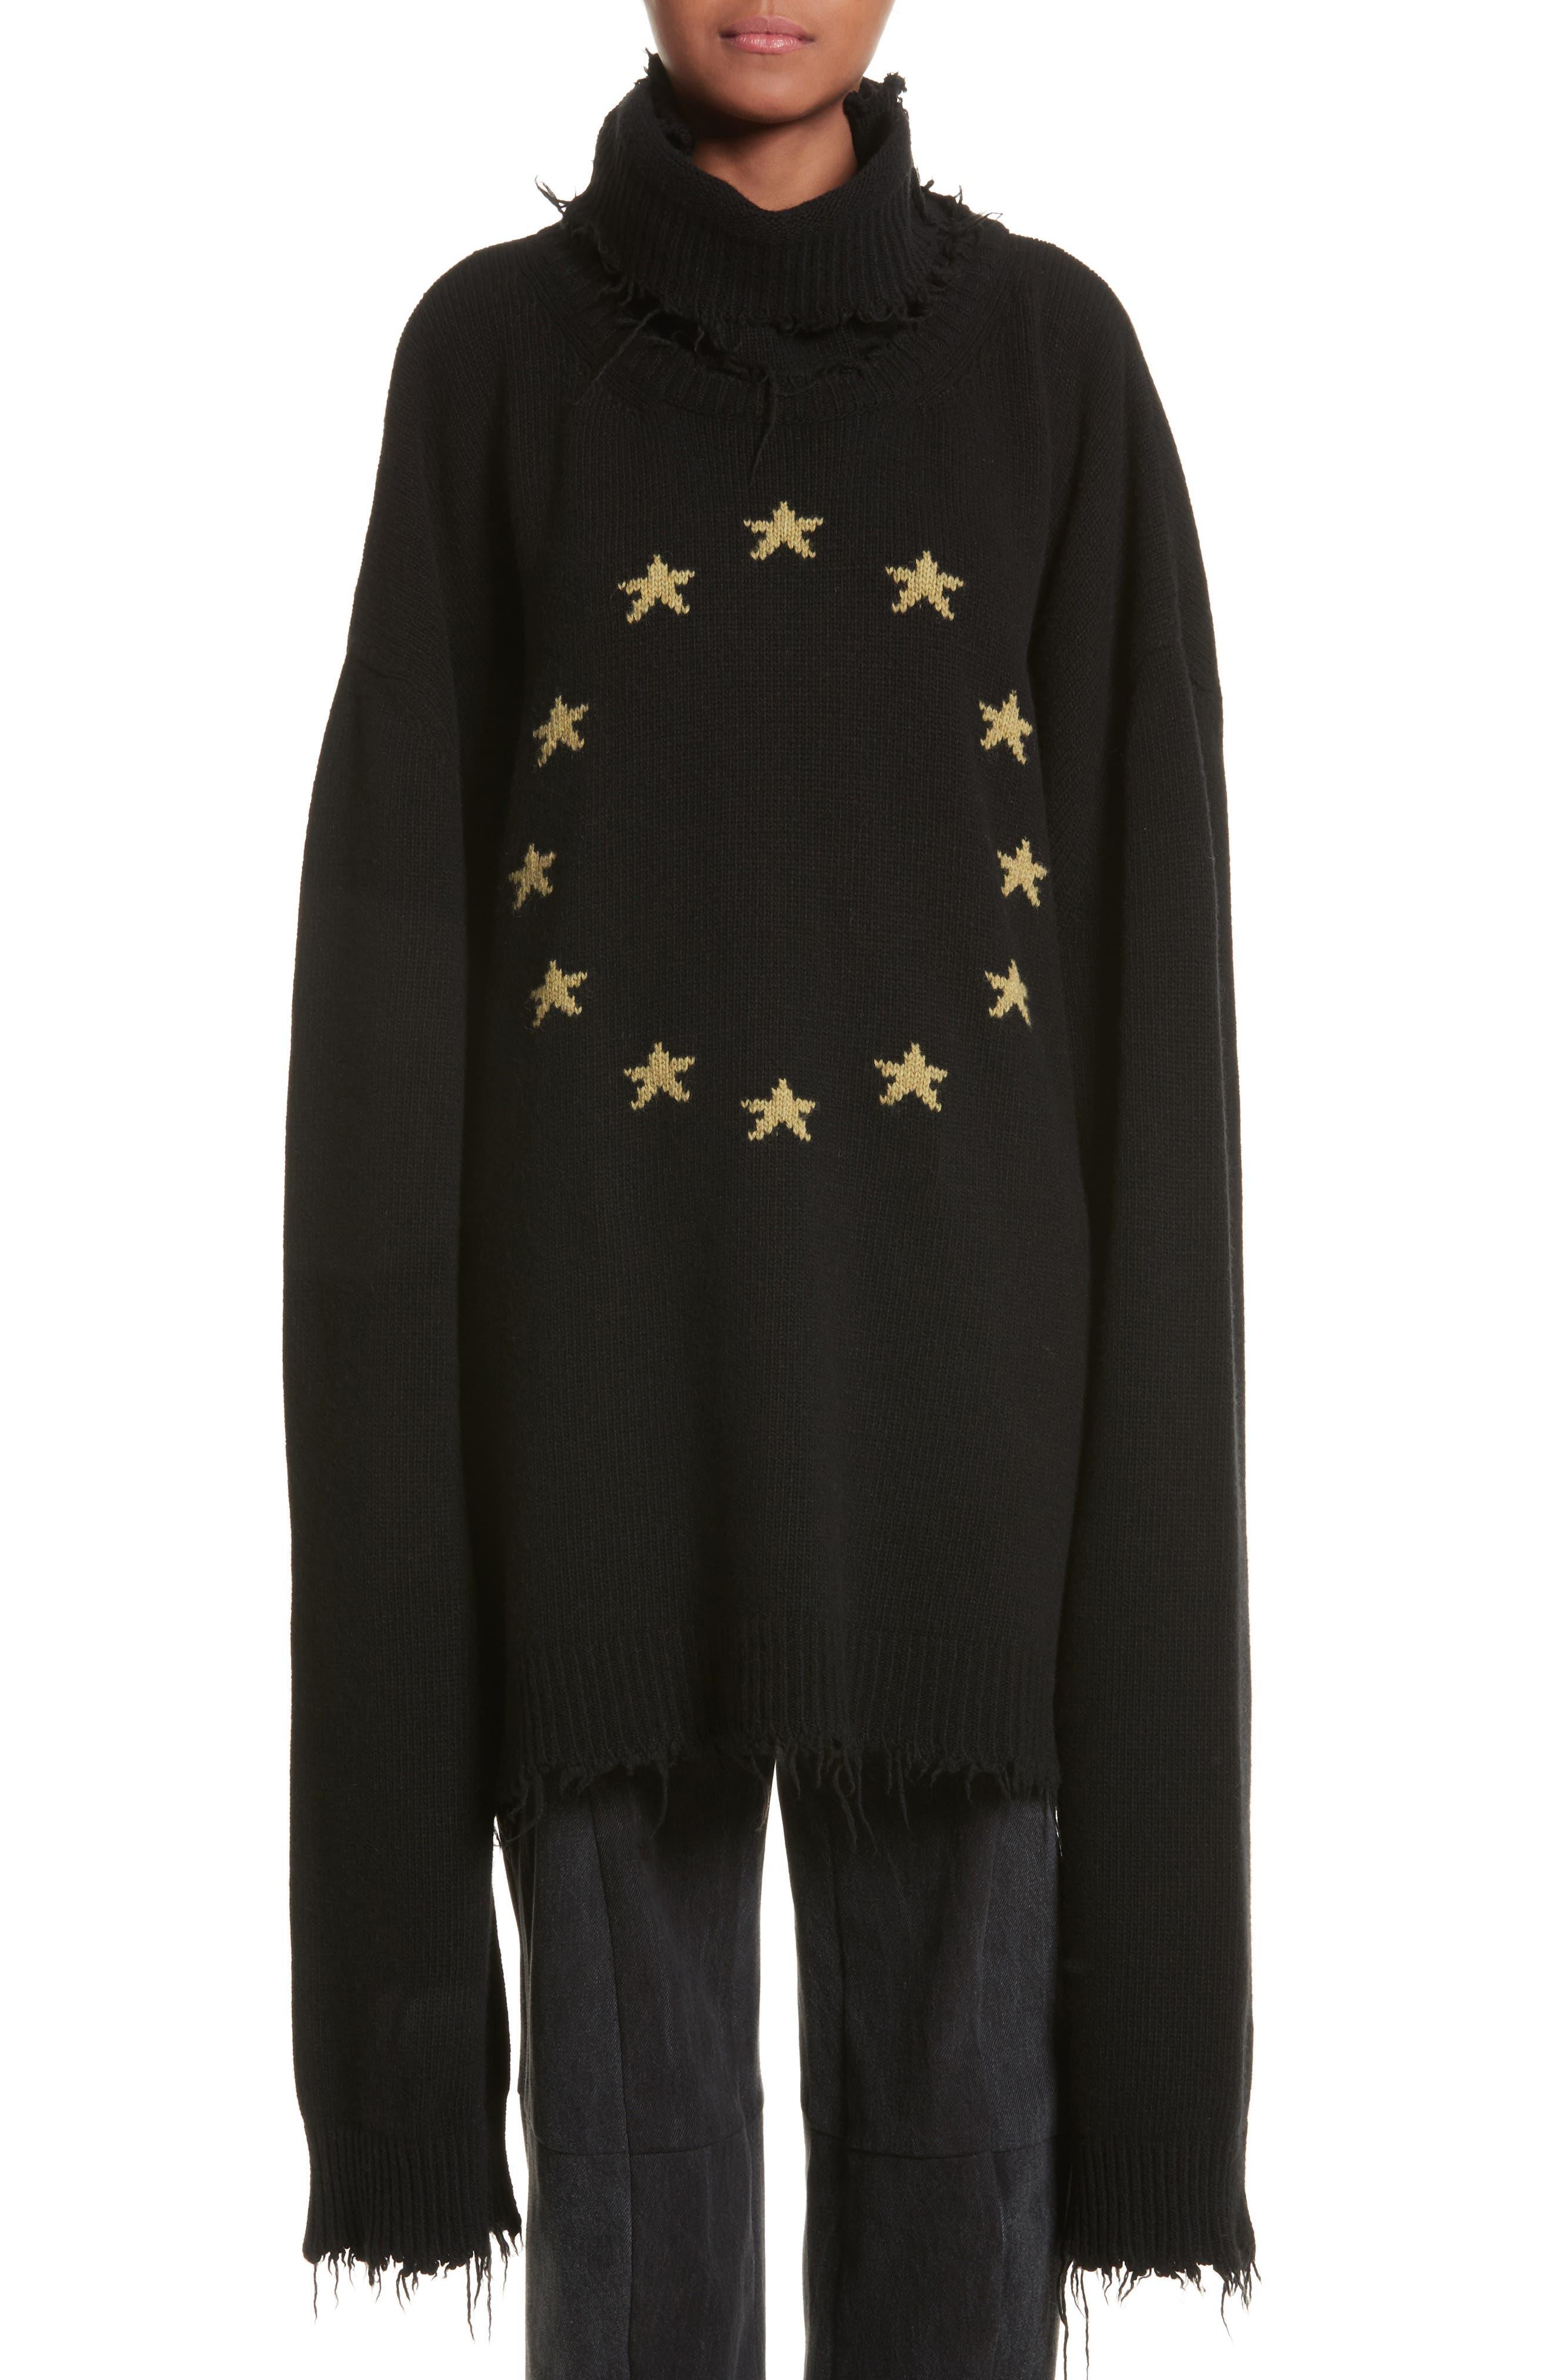 Alternate Image 1 Selected - Vetements Star Turtleneck Sweater